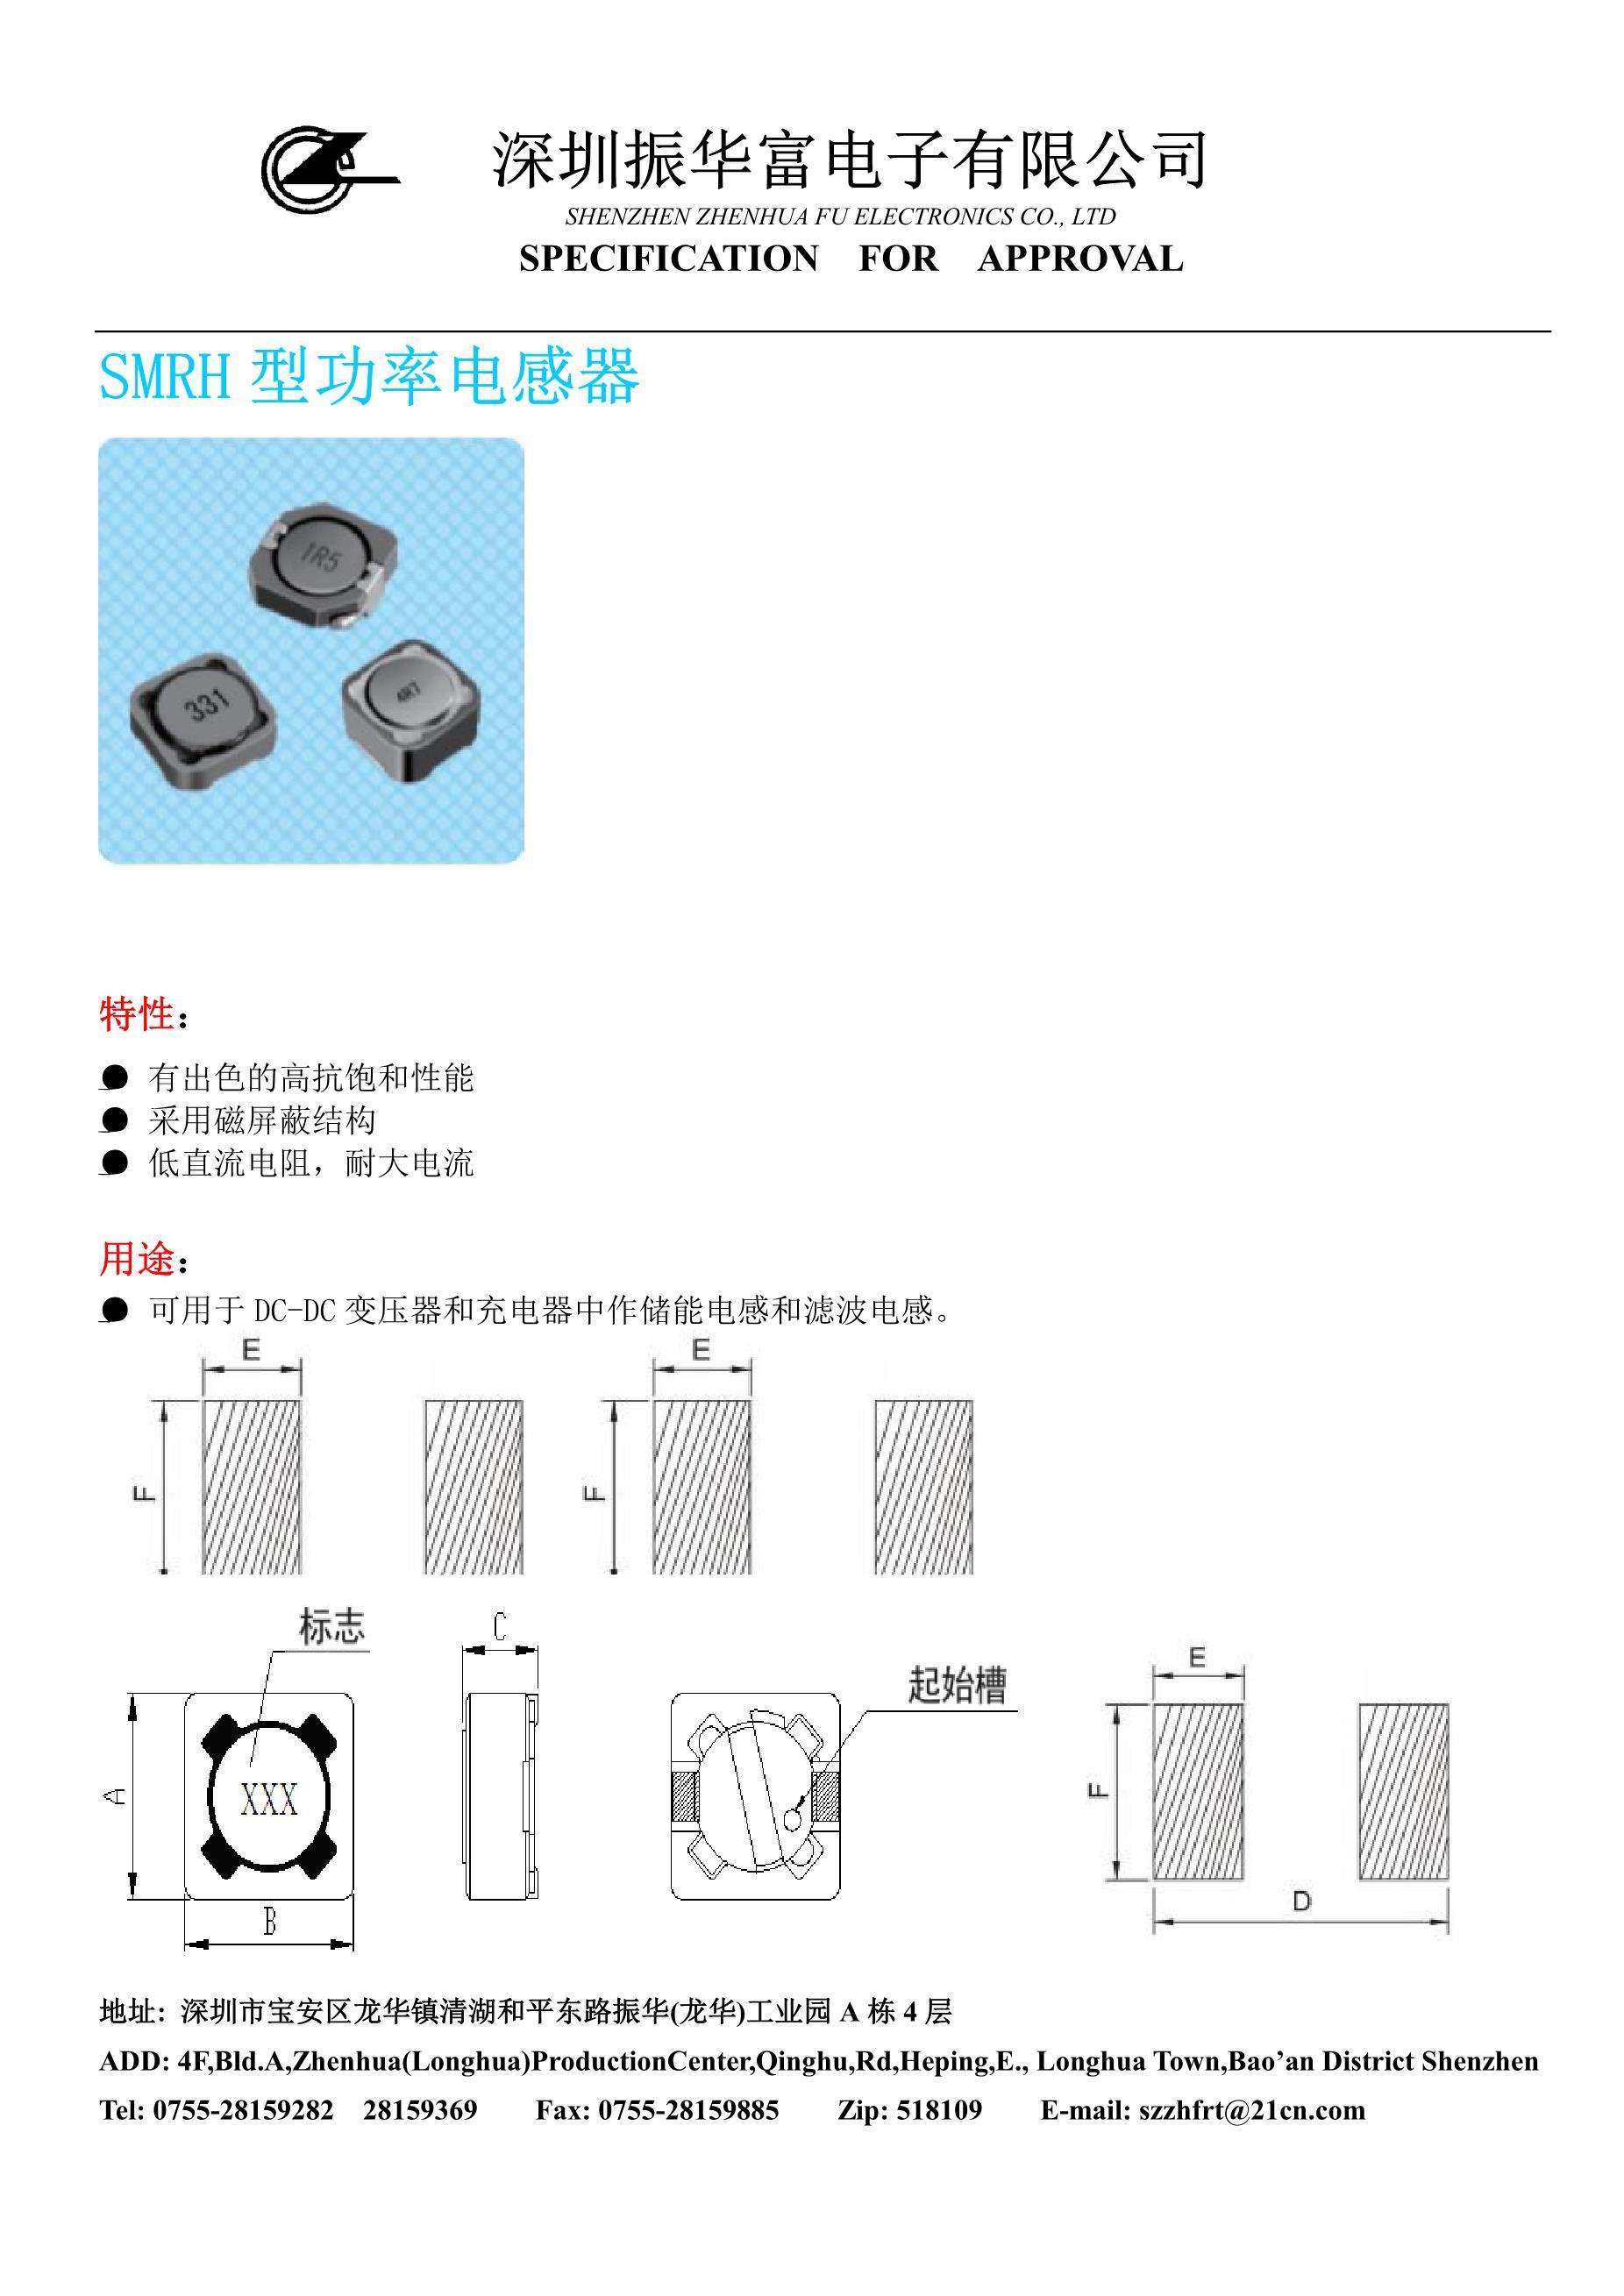 100N03LT's pdf picture 1